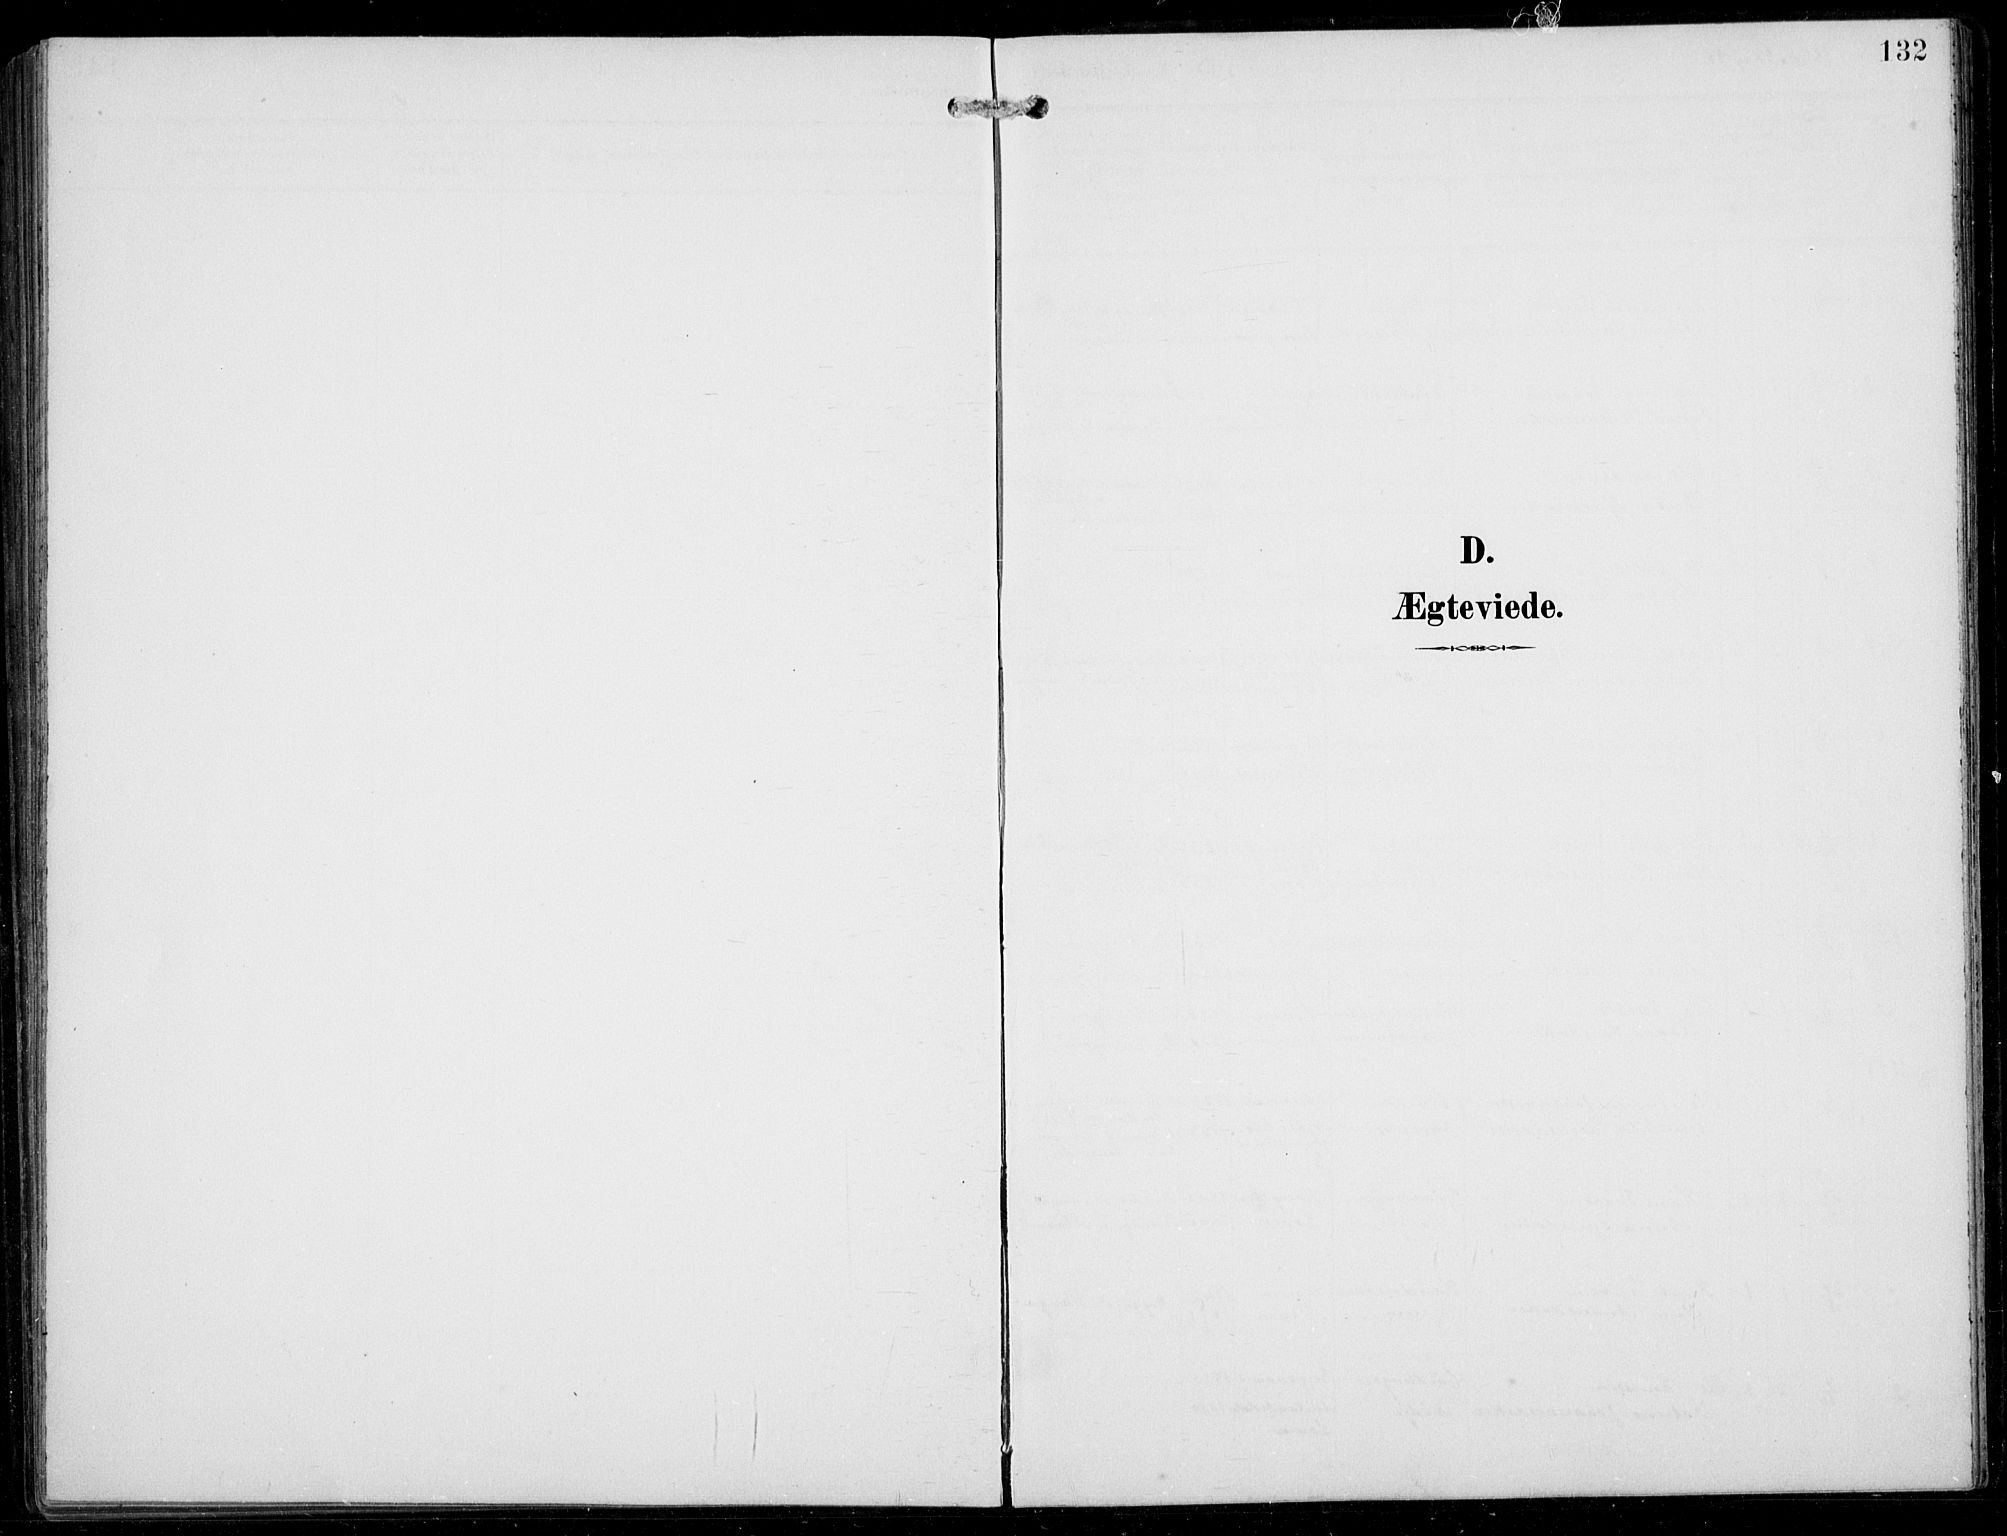 SAB, Aurland sokneprestembete, H/Hb/Hba/L0003: Klokkerbok nr. A 3, 1896-1939, s. 132